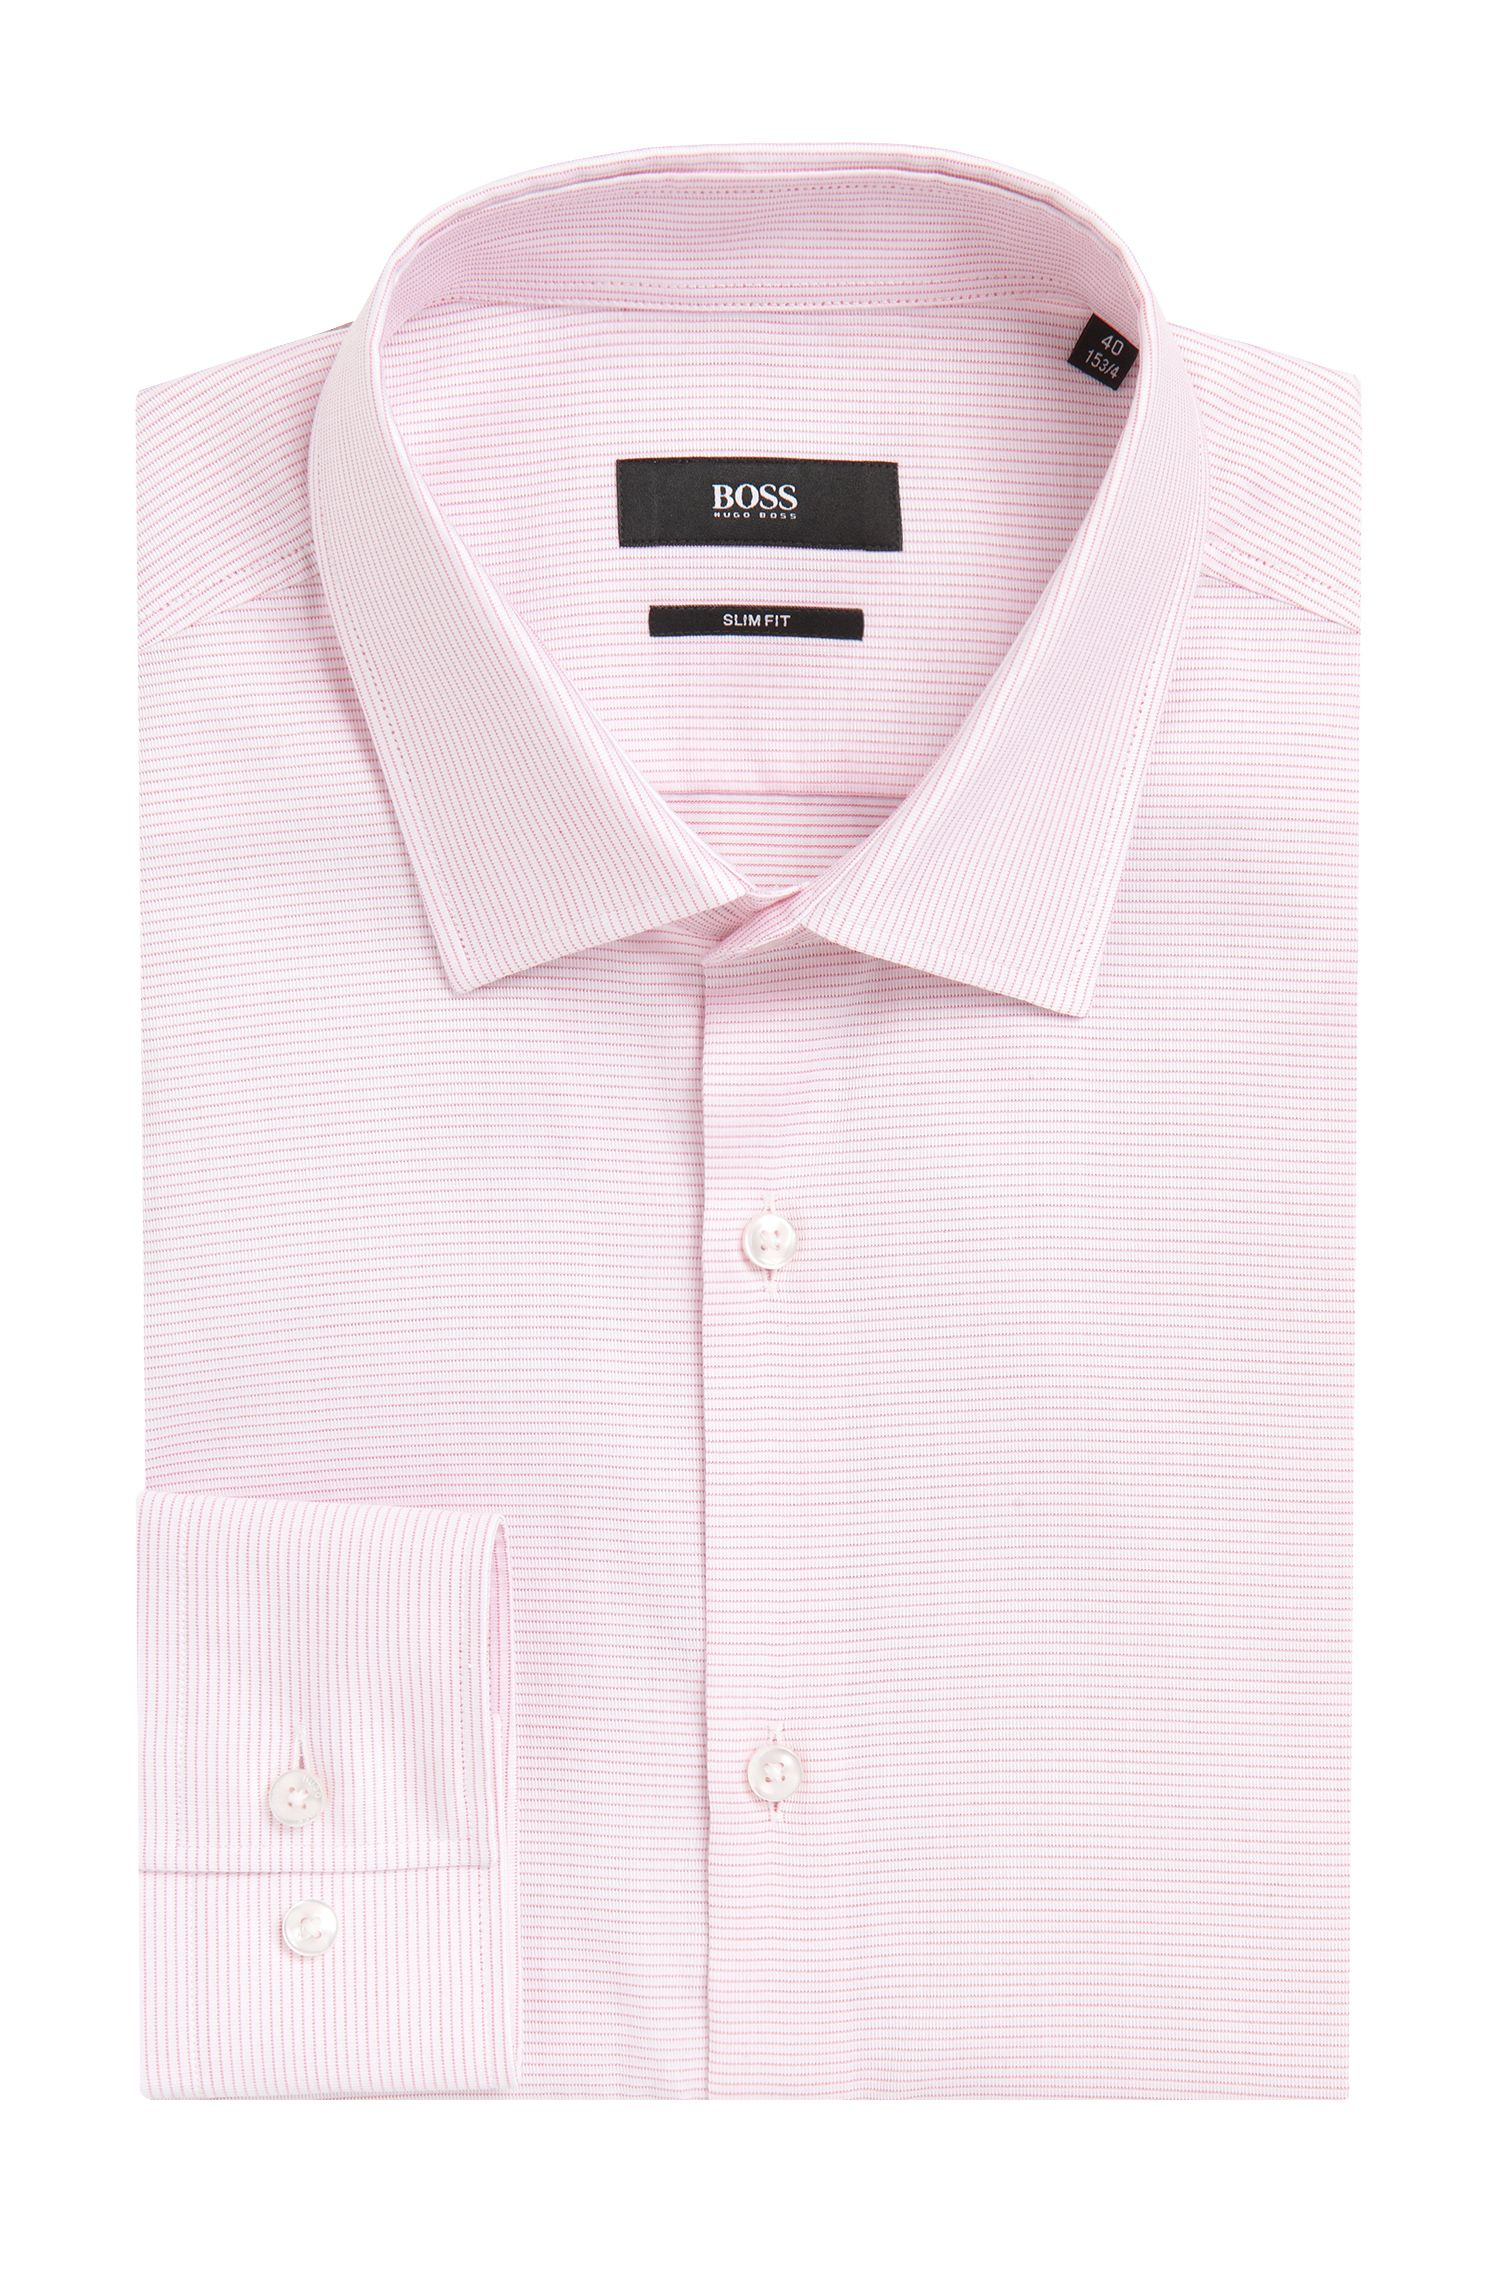 Fine Striped Cotton Dress Shirt, Slim Fit   Jenno